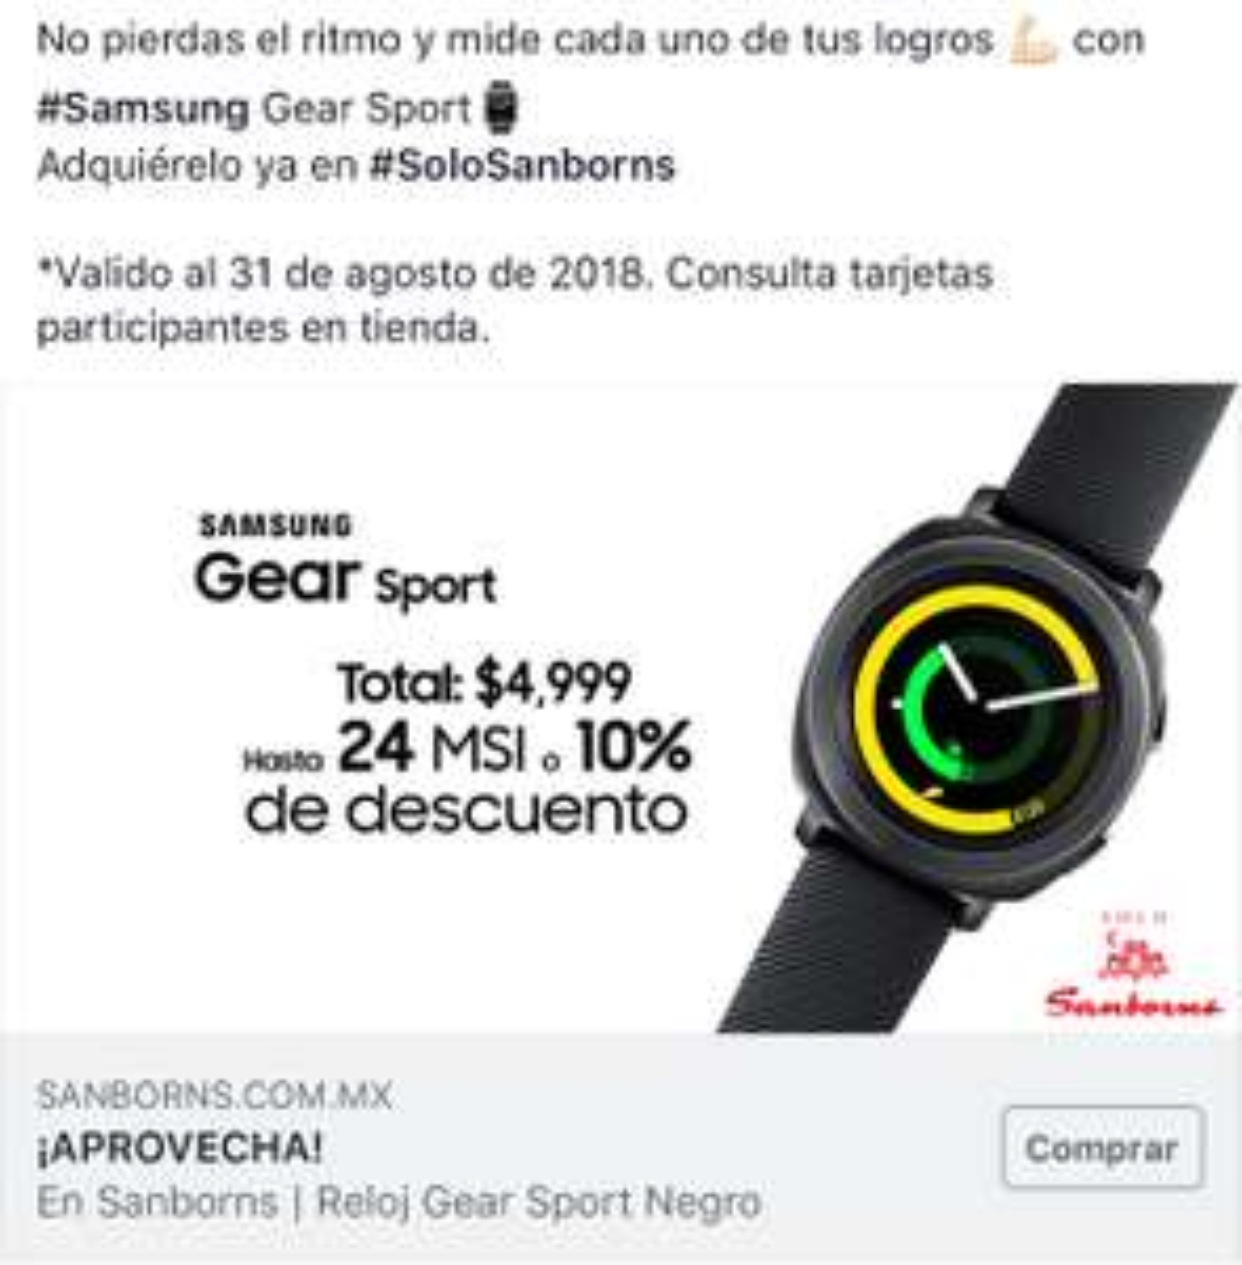 Sanborns: Gear sport